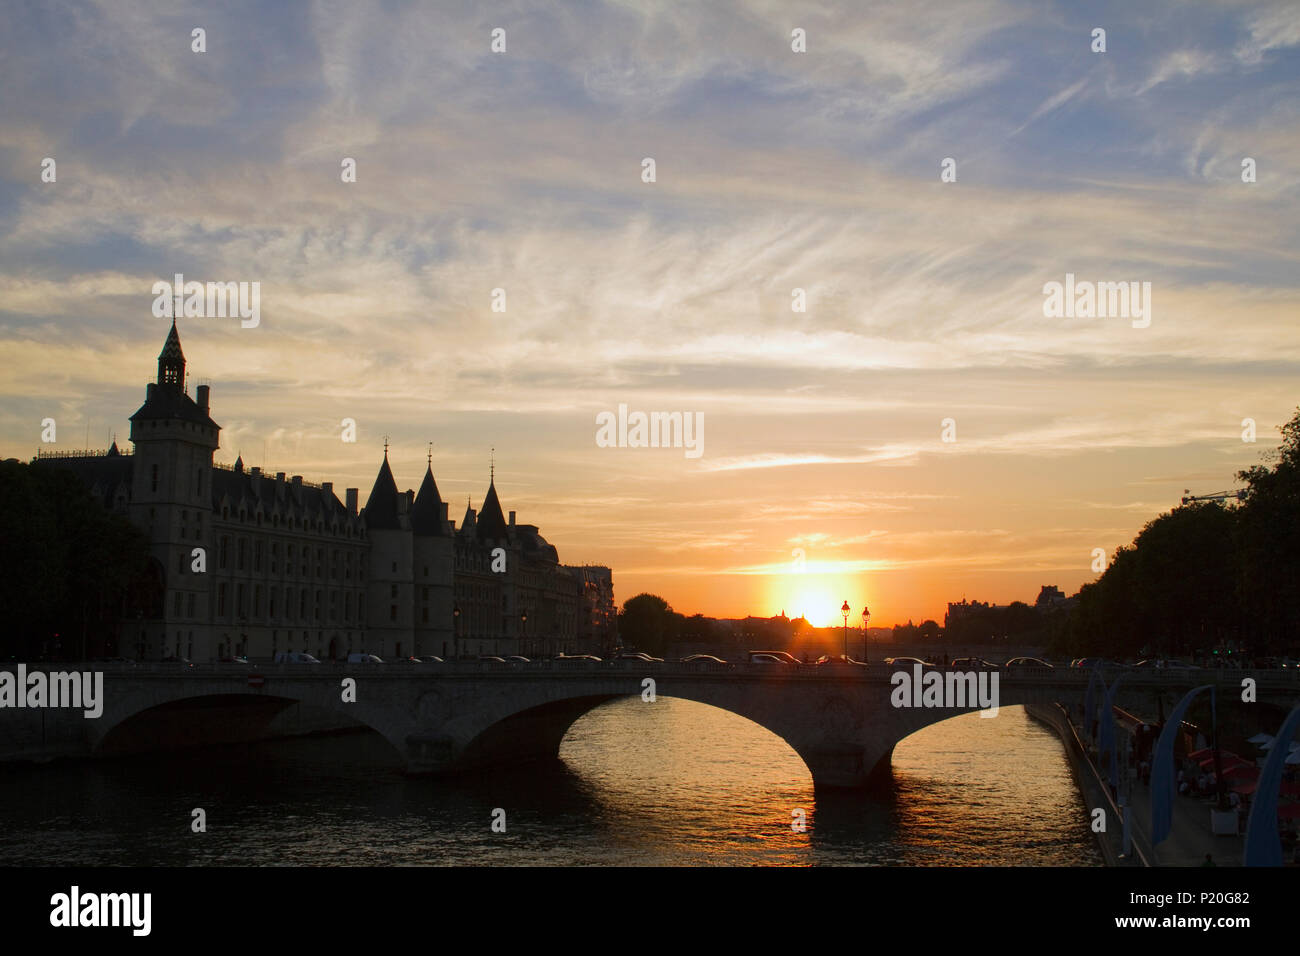 France, Paris, sunset on the Conciergerie and the Pont au Change. - Stock Image